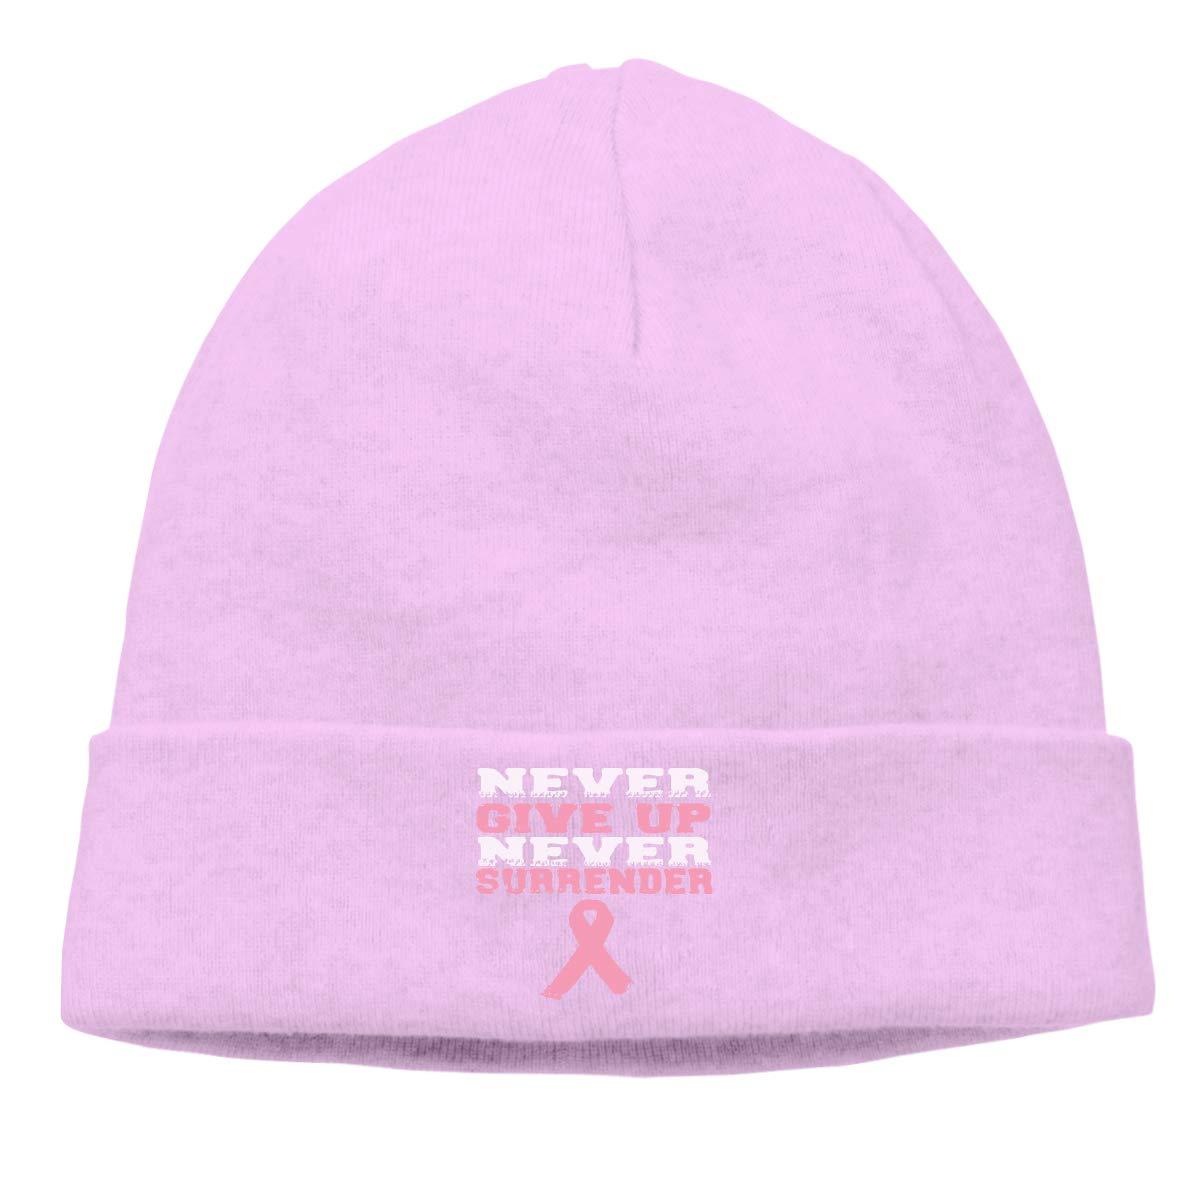 BBlooobow Men Women Breast Cancer Awareness Soft Knit Caps